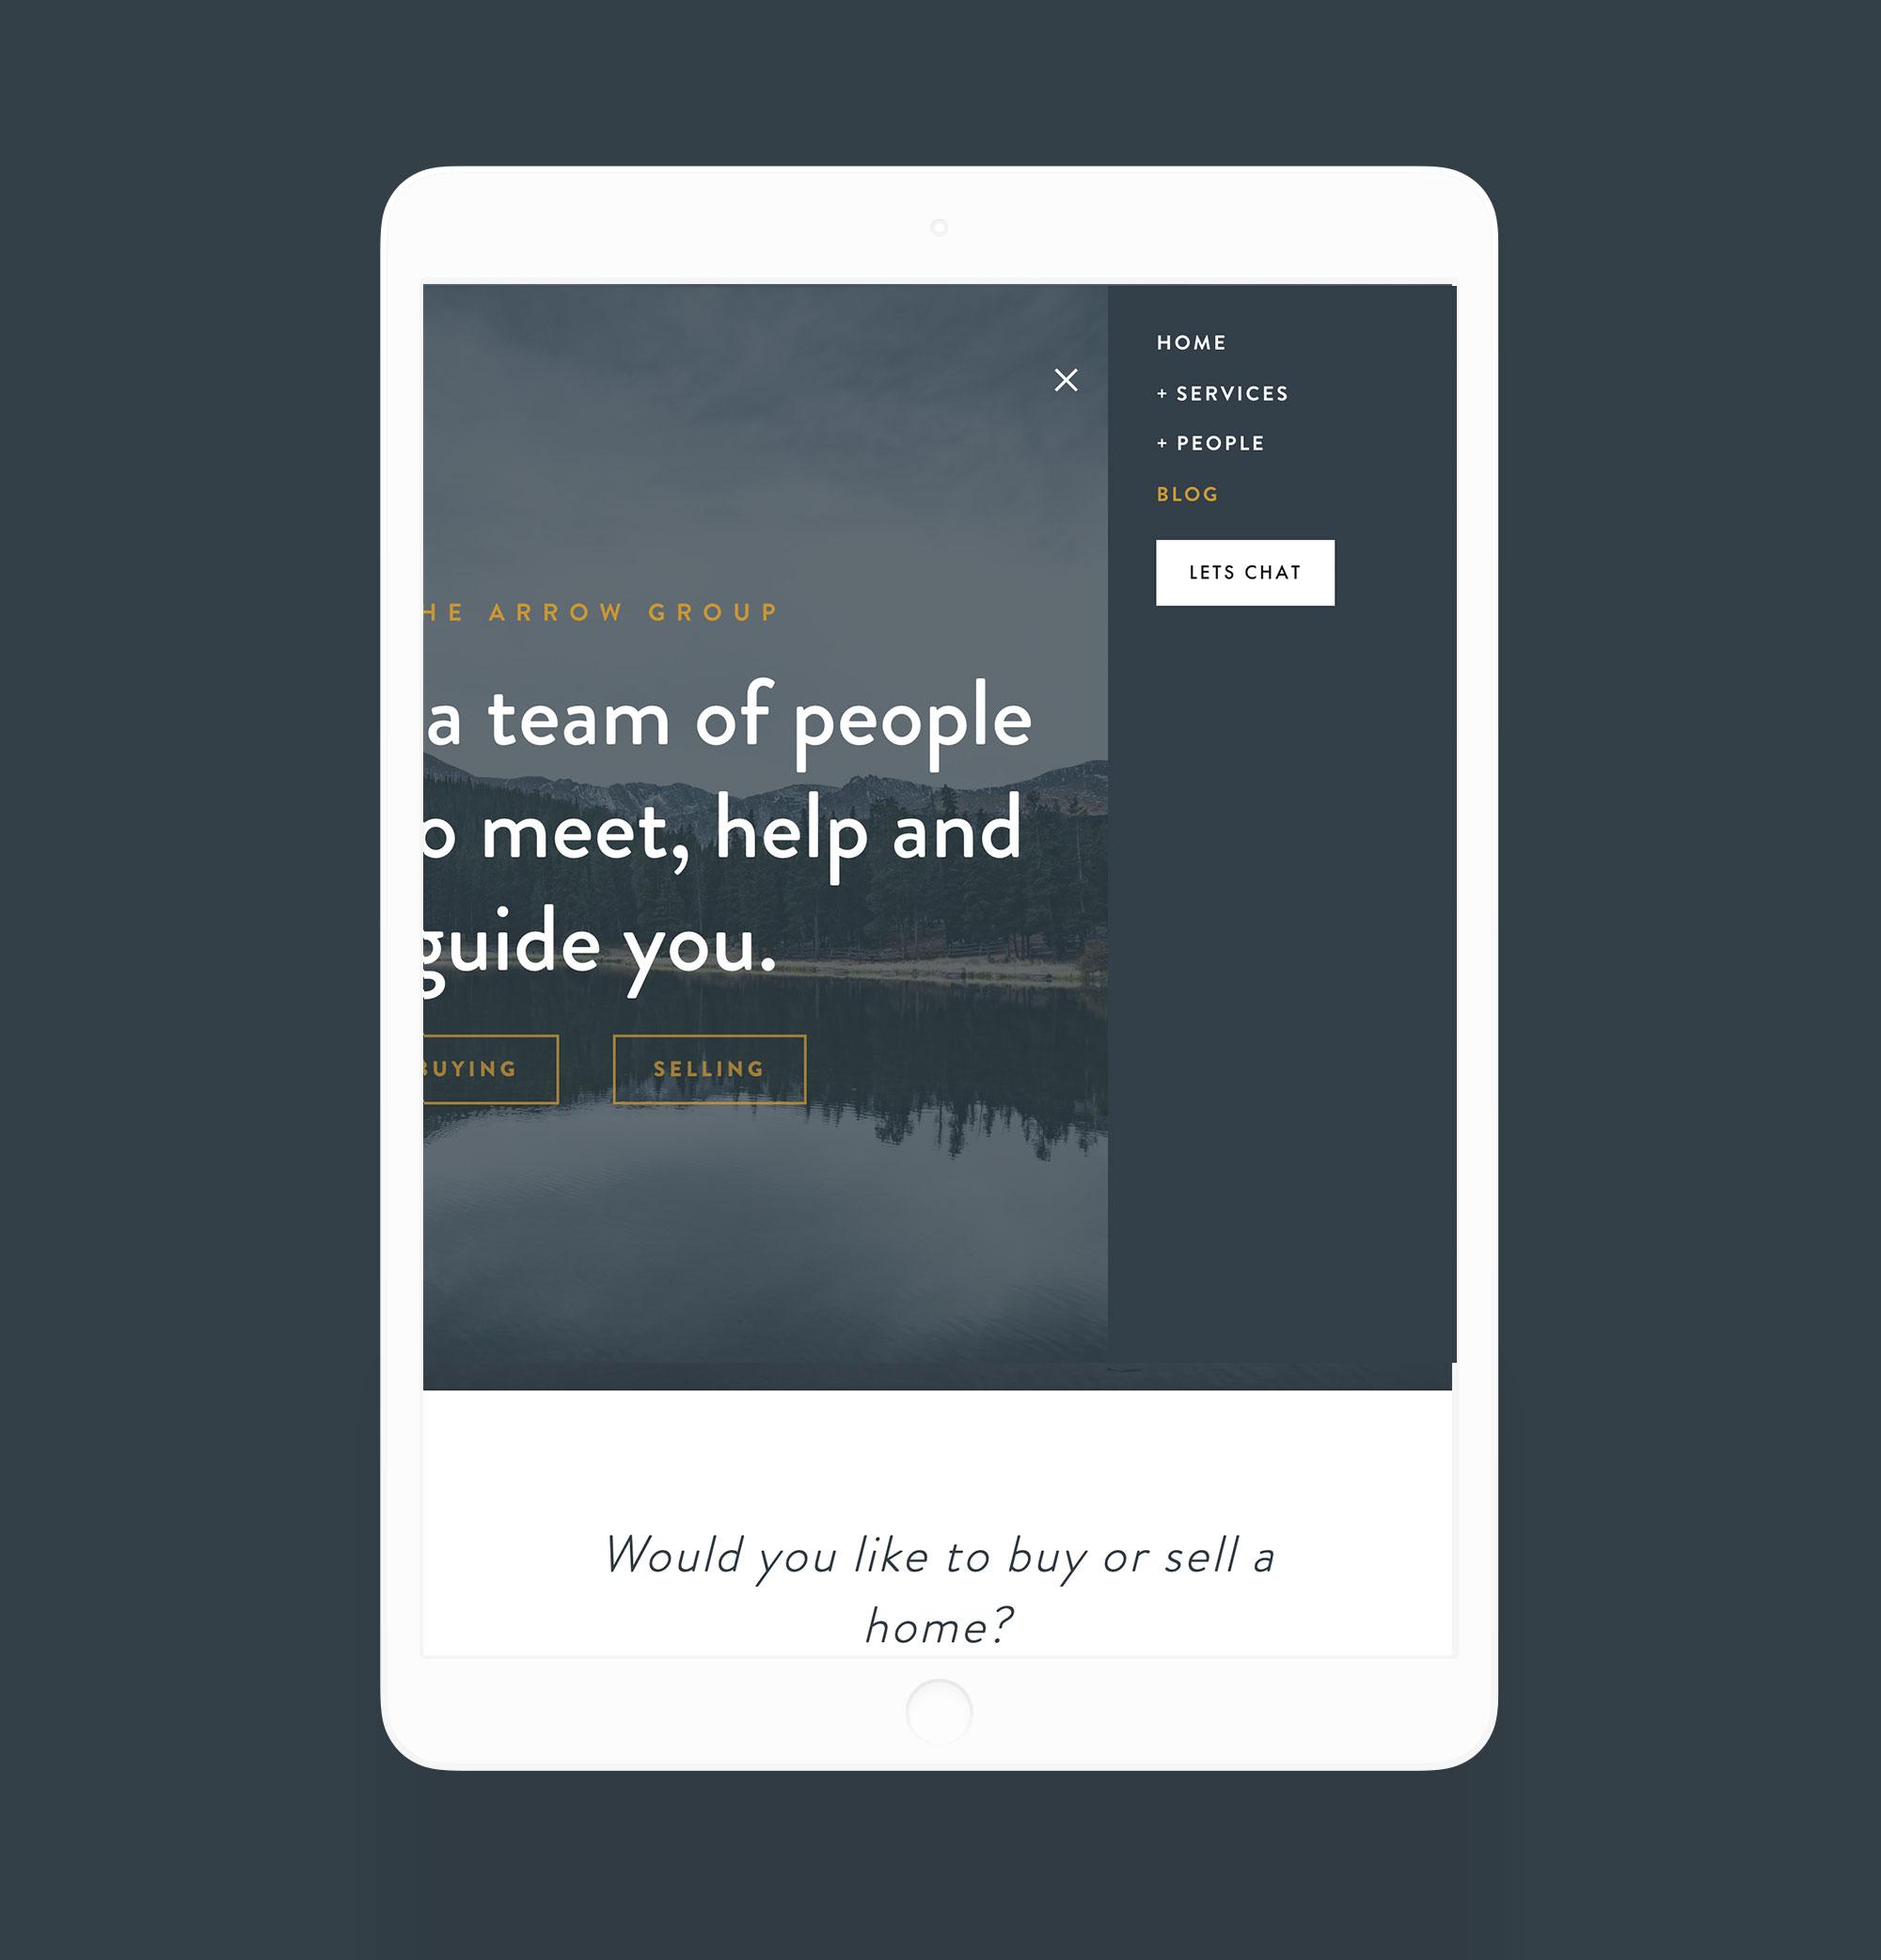 arrow-group-web-iPad-blog.jpg